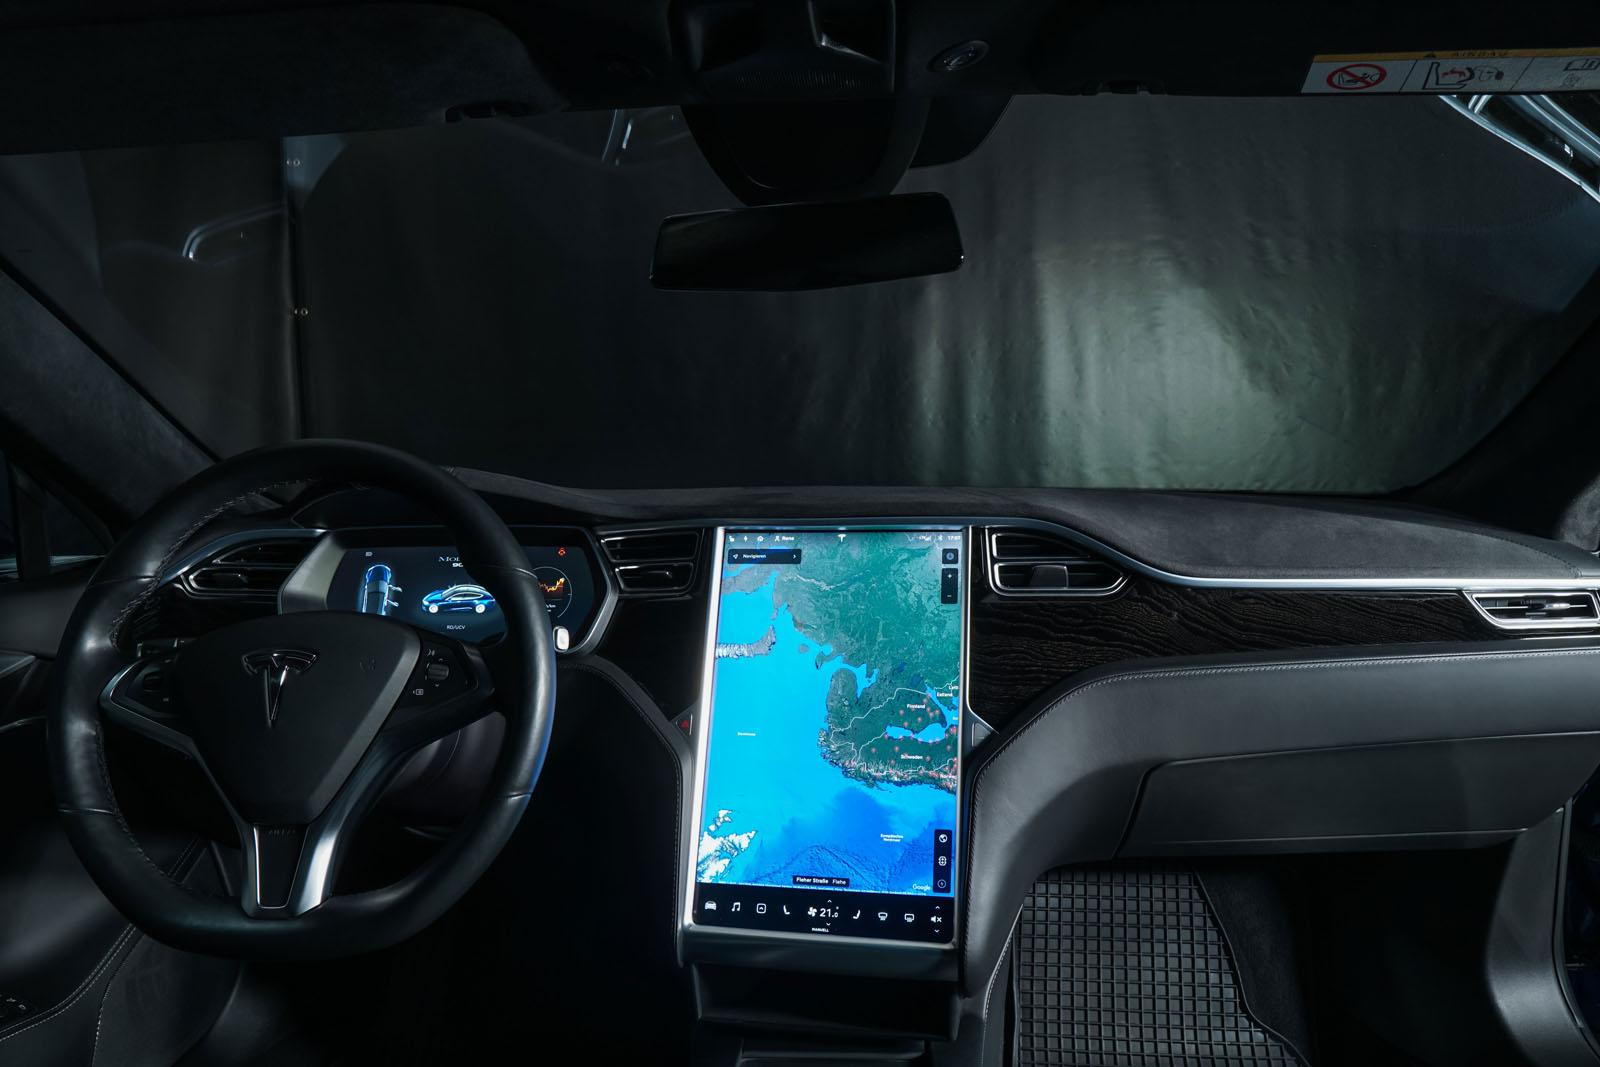 Tesla_ModelS_90D_Blau_Schwarz_Tes-0513_16_w